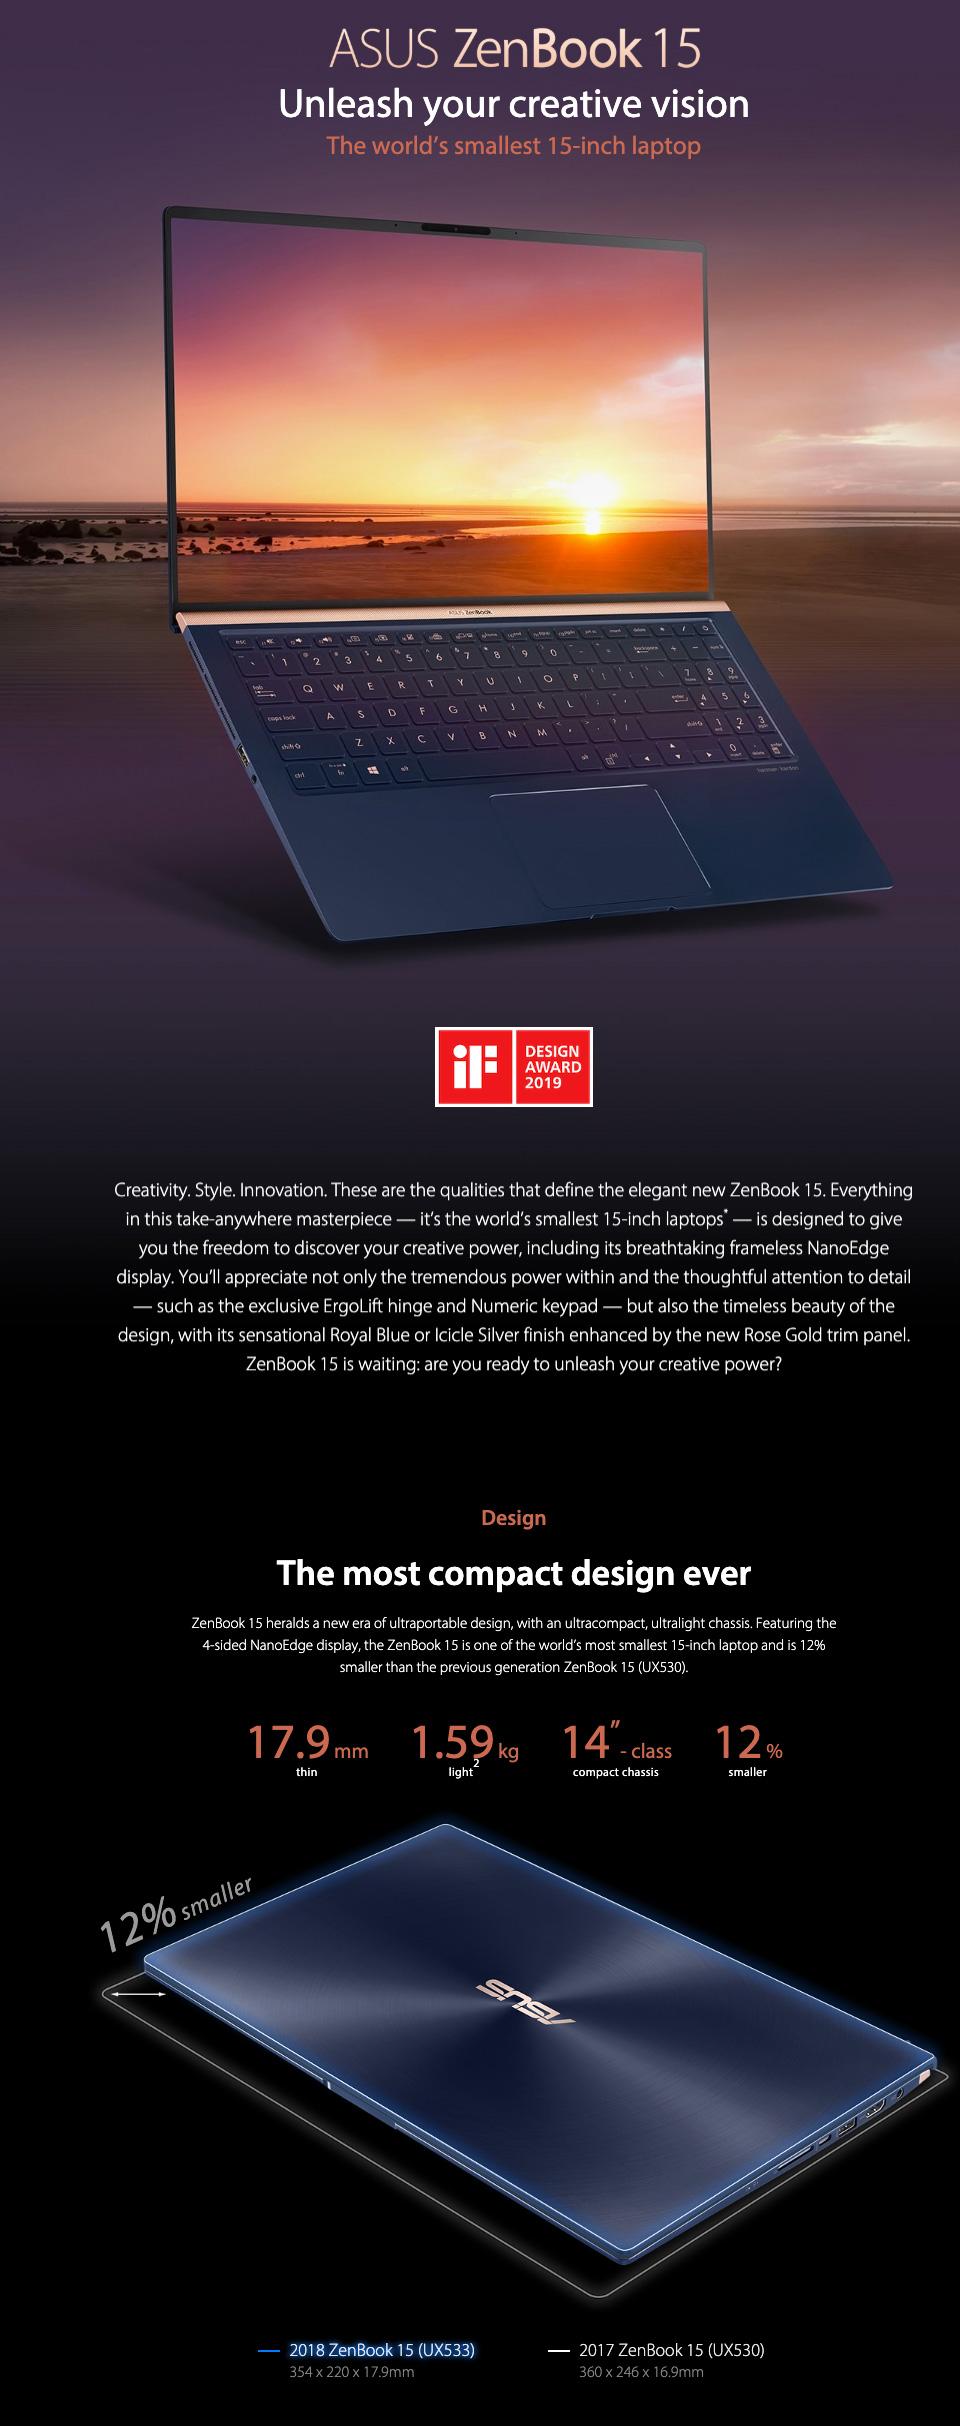 ASUS ZenBook Core i7-8565U GTX 1050 FHD 15.6in Laptop features 1